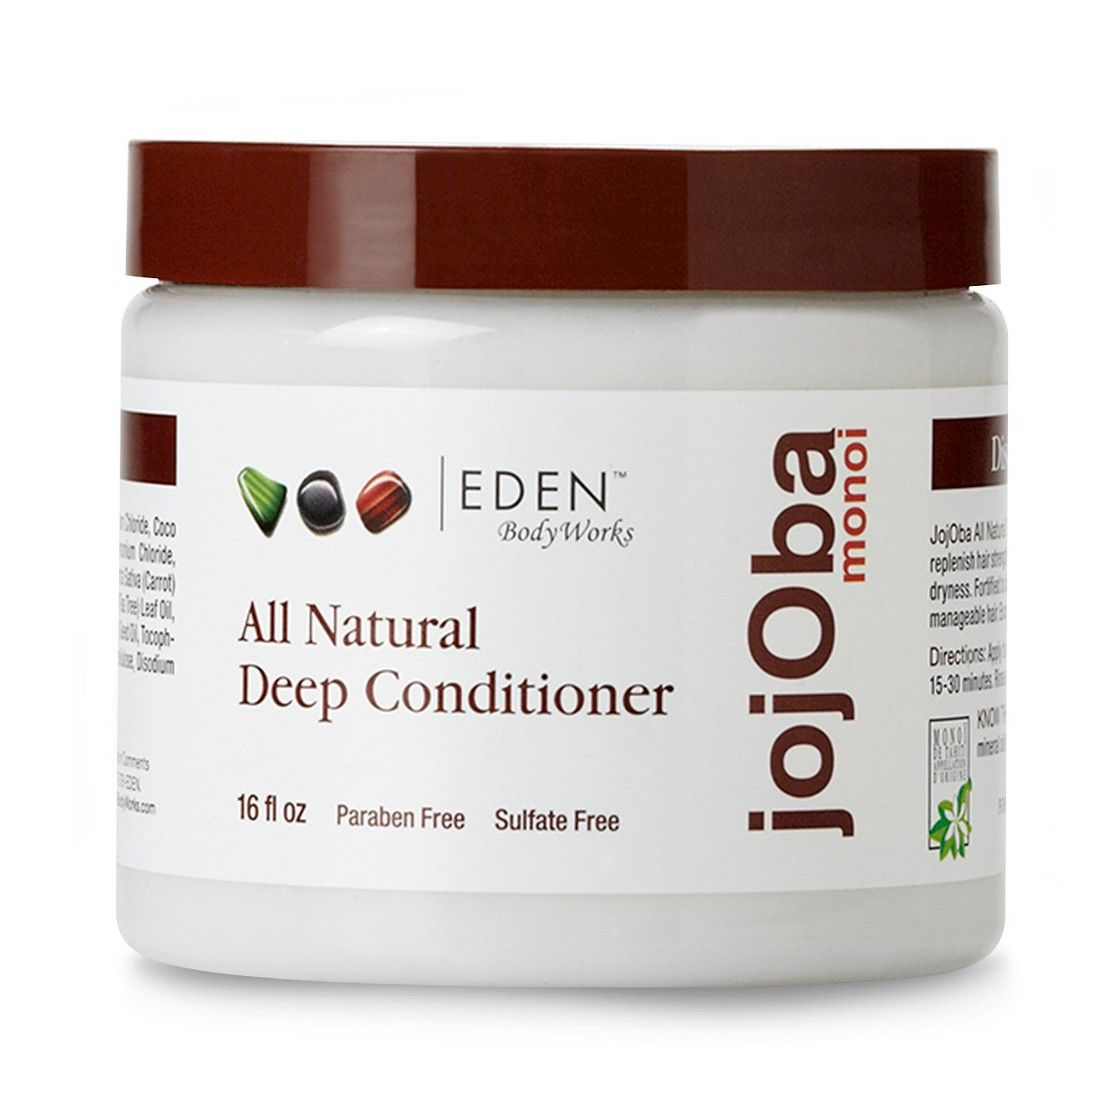 Eden BodyWorks Jojoba Monoi Deep Conditioner 16 fl oz